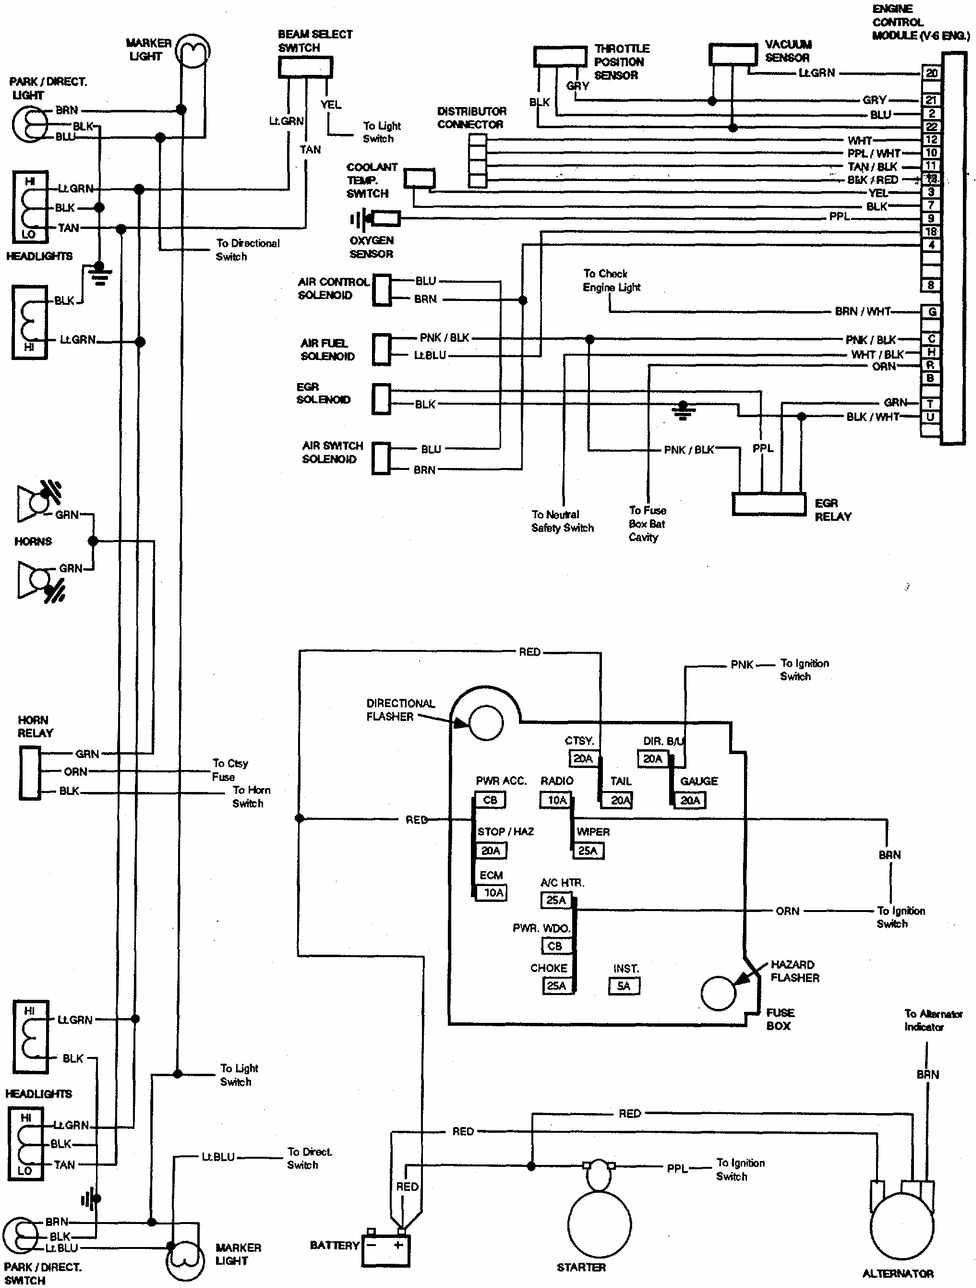 2001 Peterbilt Wiring Diagram moreover 97 Dodge Ram 1500 Headlight Relay Location besides Peterbilt Sleeper Wiring Diagram Light together with Peterbilt 359 Wiring Schematic further 2004 Peterbilt Wiring Diagram. on peterbilt 387 wiring diagram